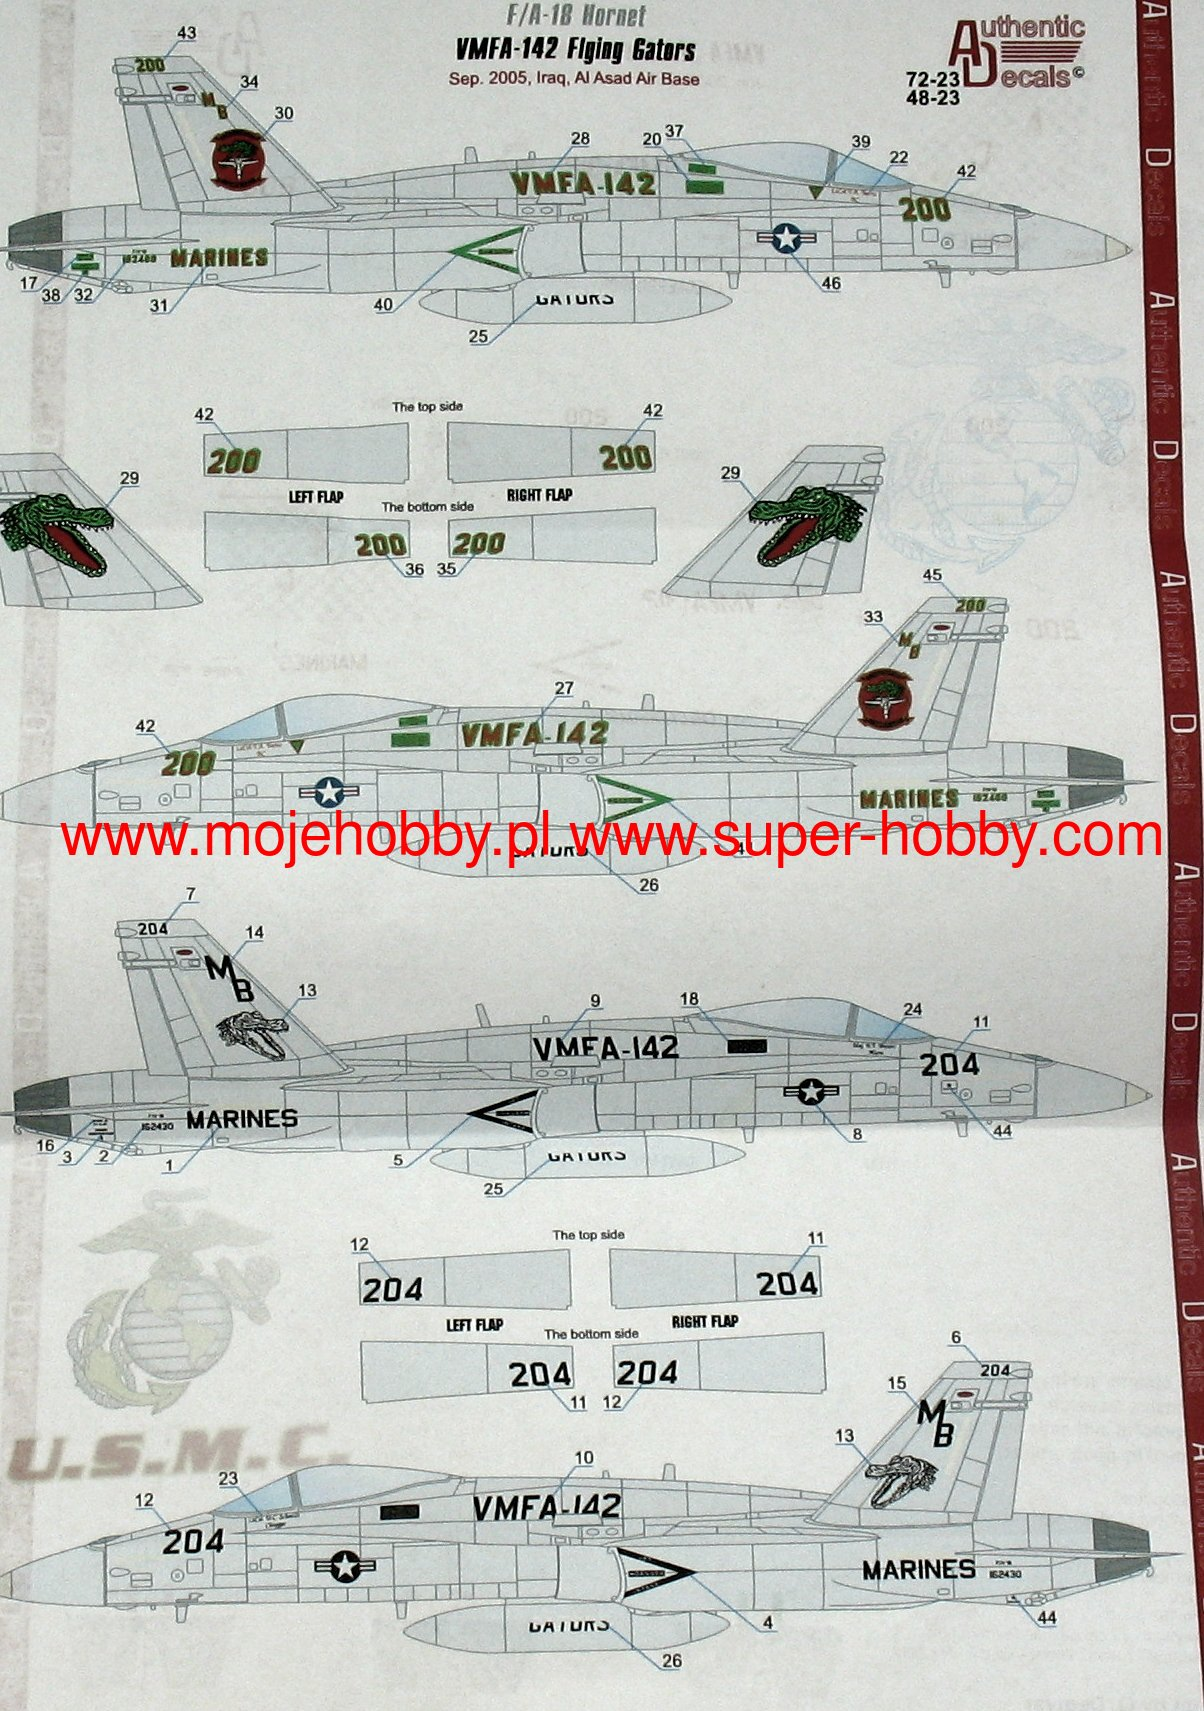 F 18 Hornet Vmfa 142 312 Modern Us Marine Authentic Decals F18 Jet Engine Diagram 2 Atd 72 23